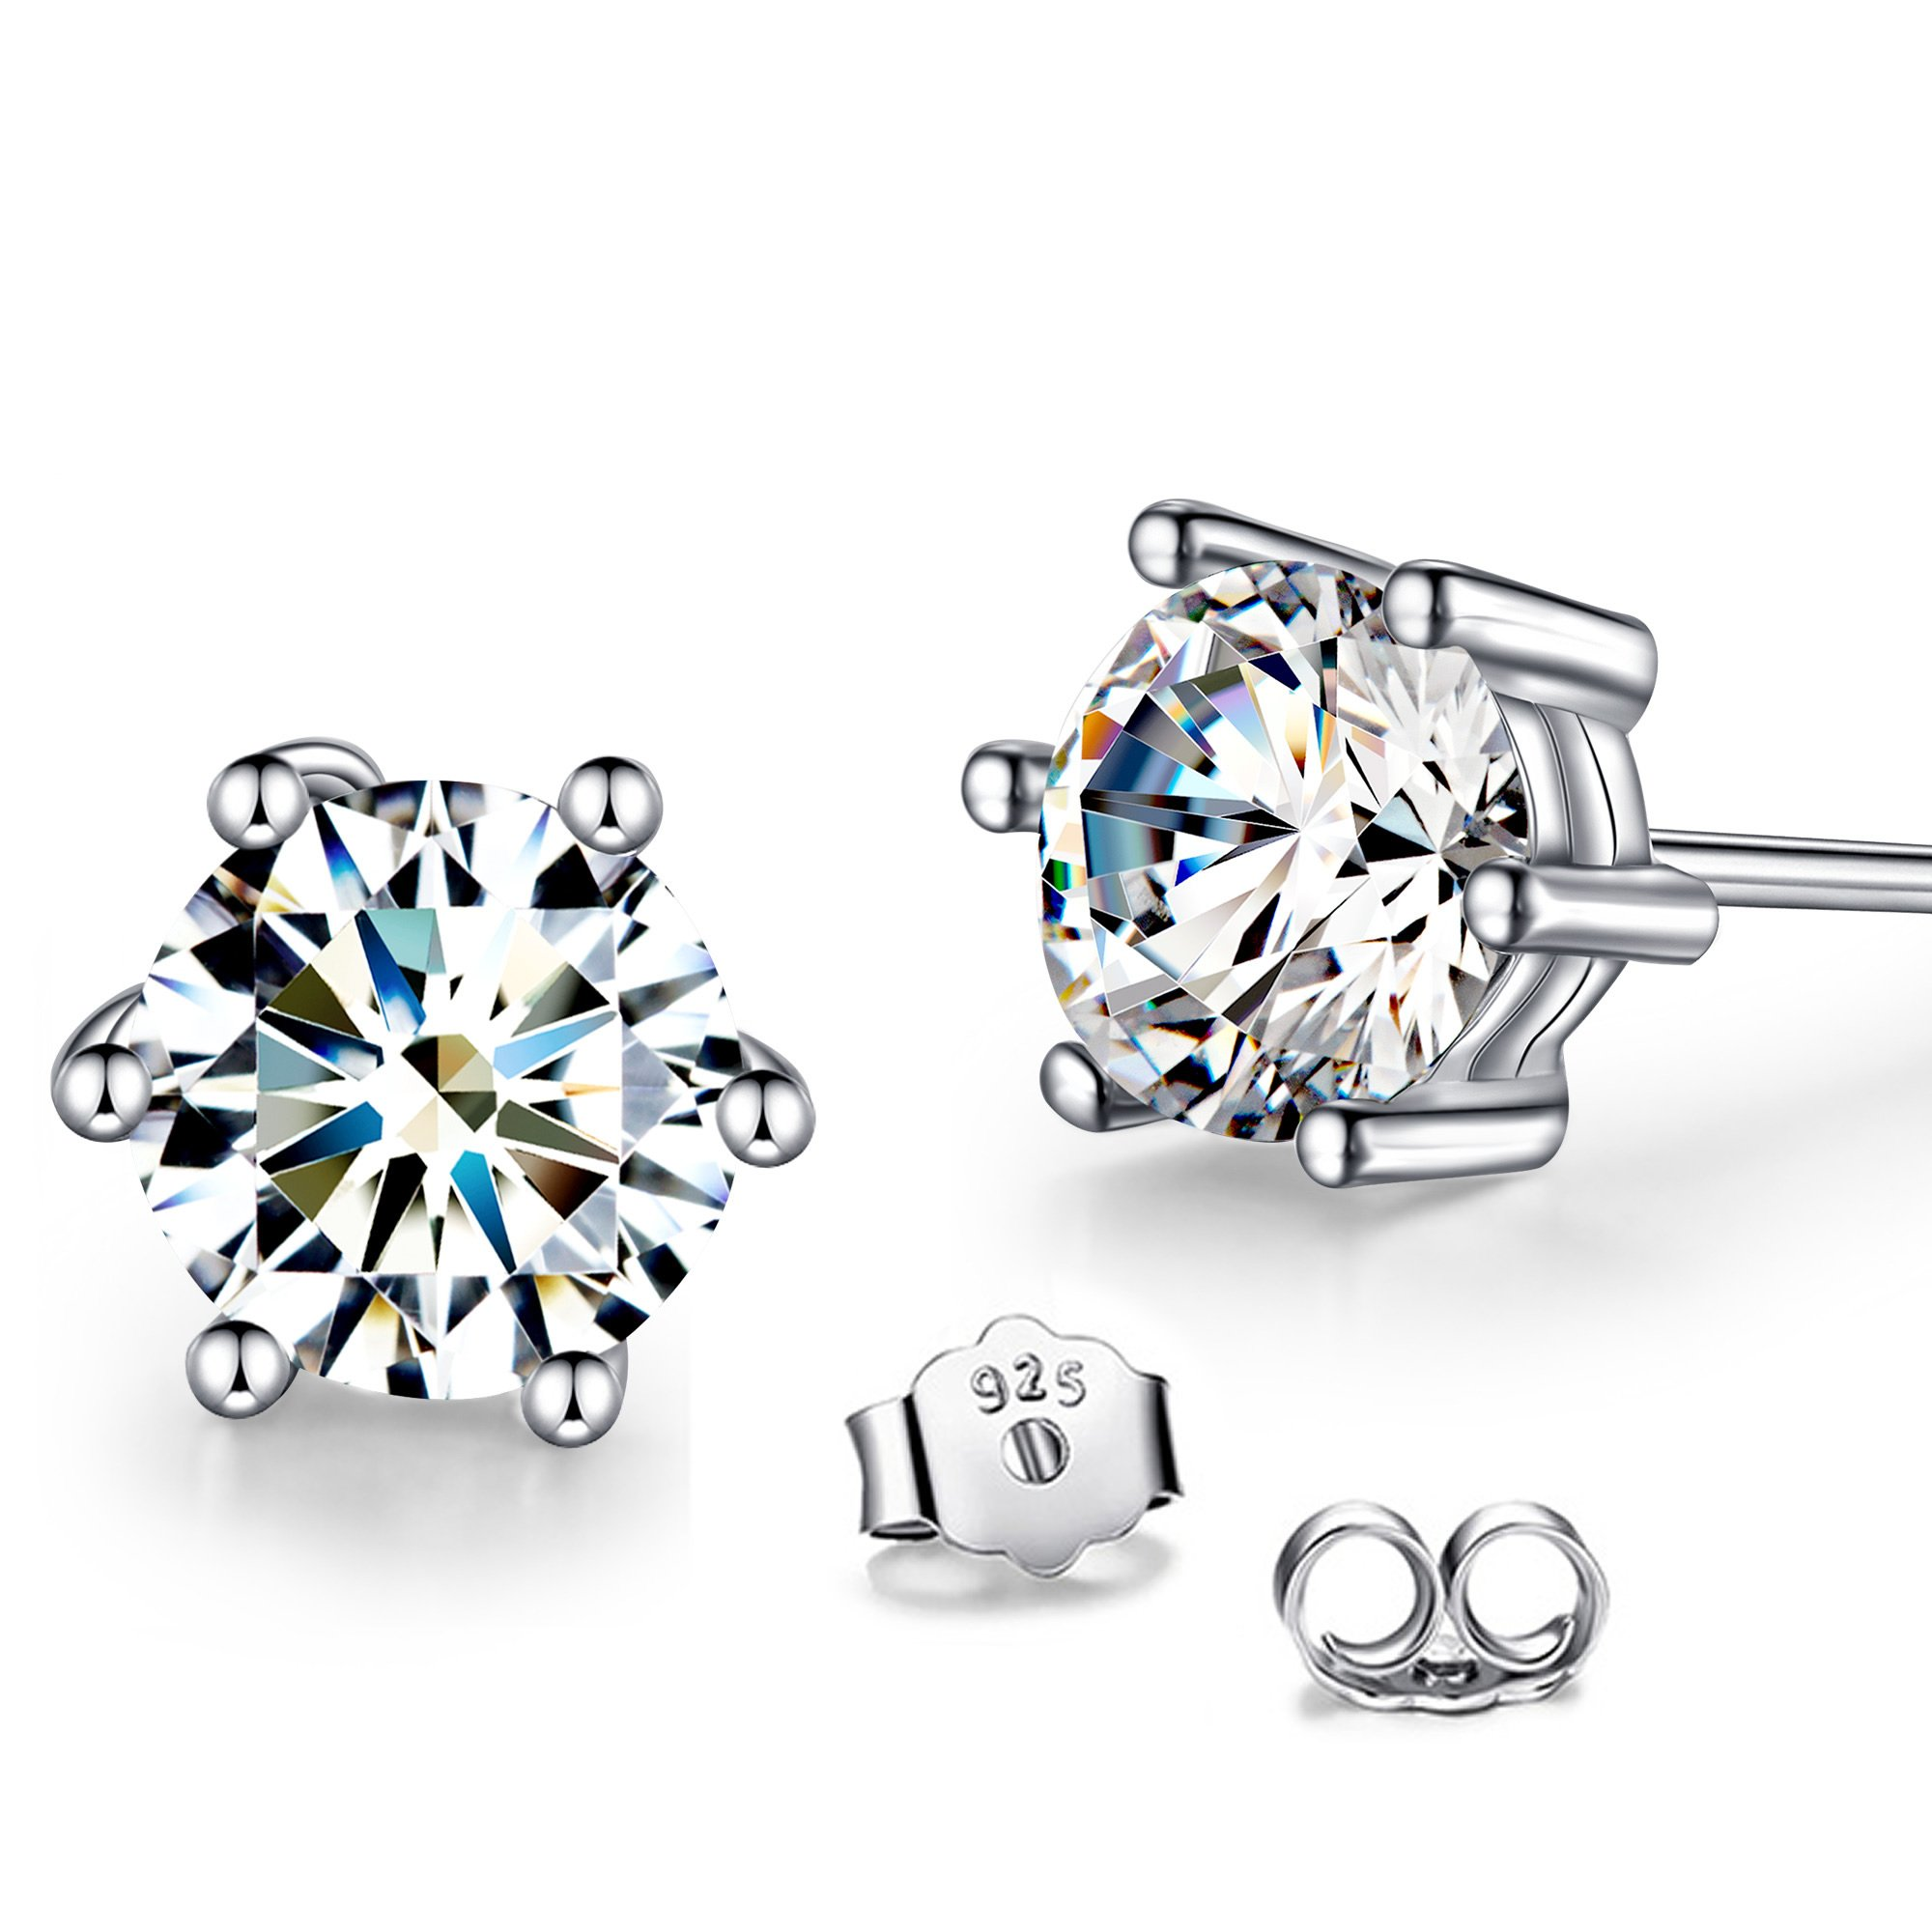 T400 925 Sterling Silver Stud Earrings Swarovski Cubic Zirconia CZ Simulated Diamond Unisex Gift